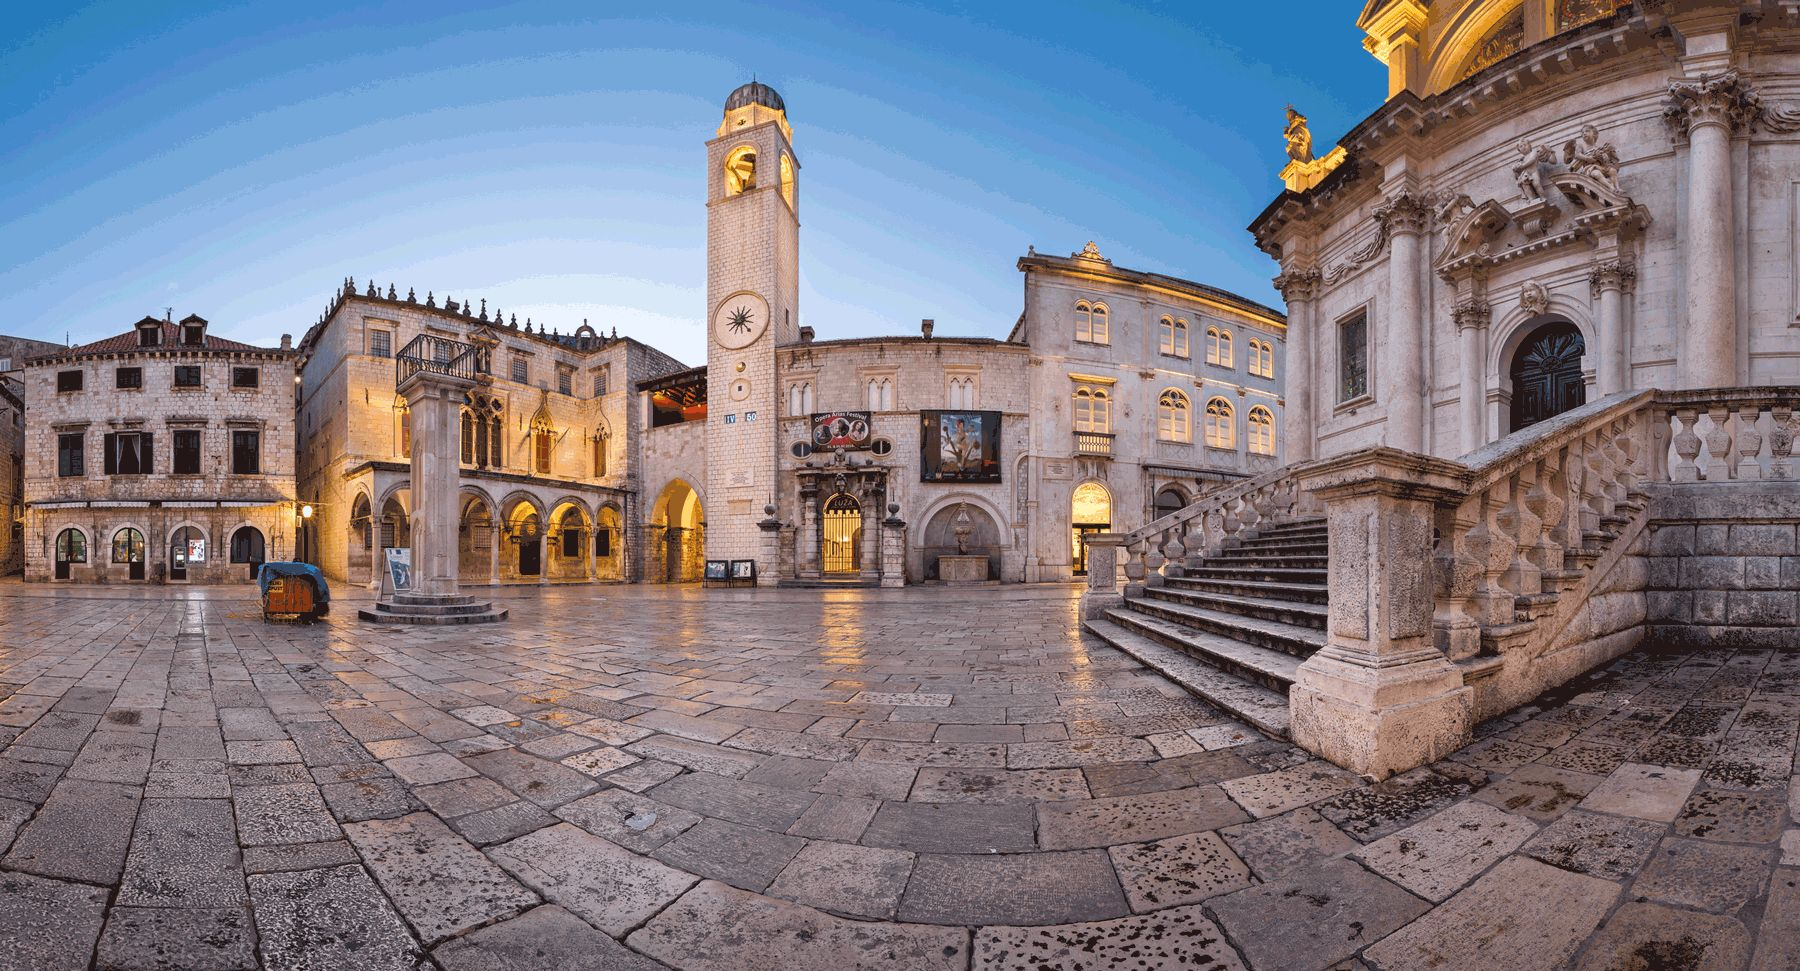 Dubrovnik Sponza Palast iStock 676030226 2 klein web